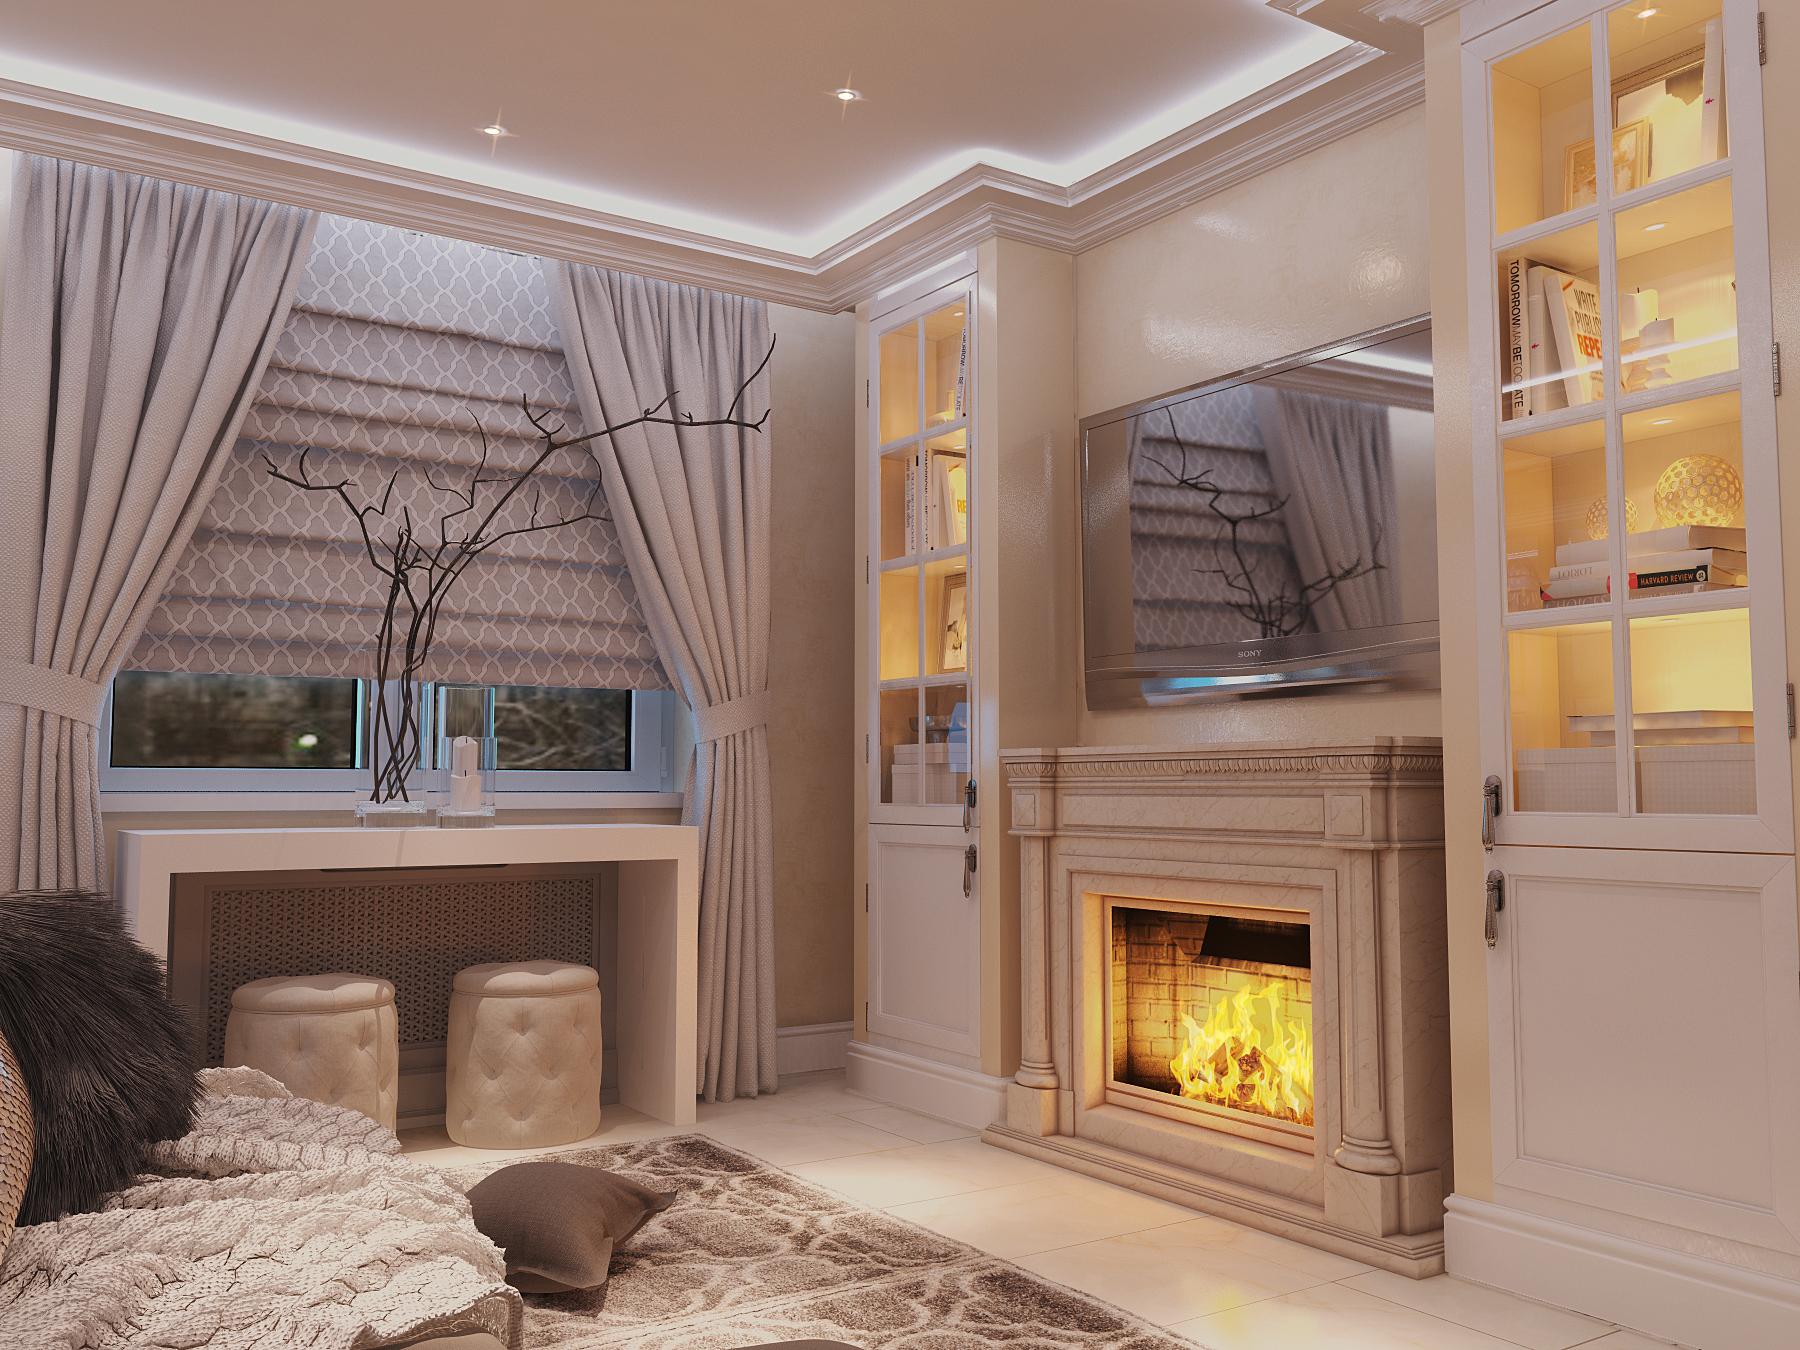 Интерьер квартиры: 75 кв.м в классическом стиле